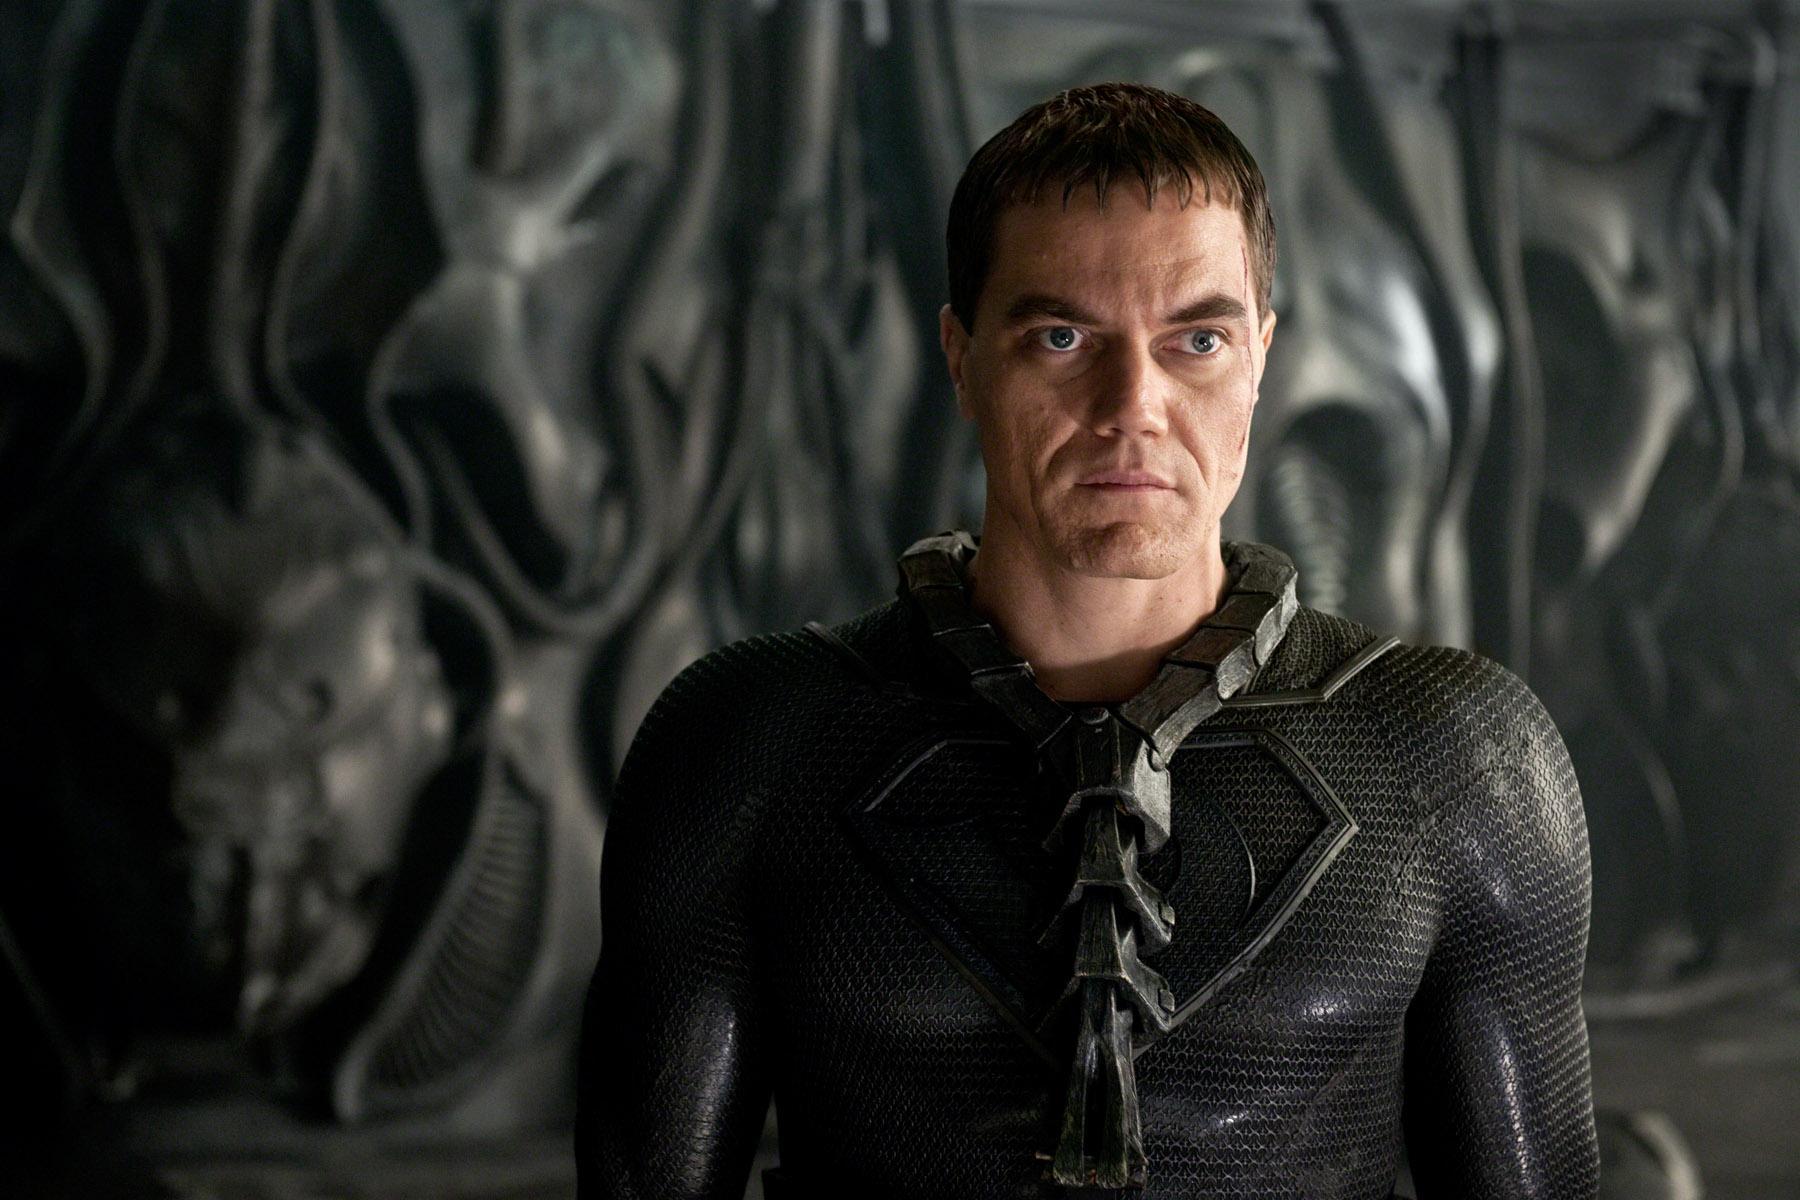 Michael Shannon fell asleep during Batman v Superman: Dawn of Justice